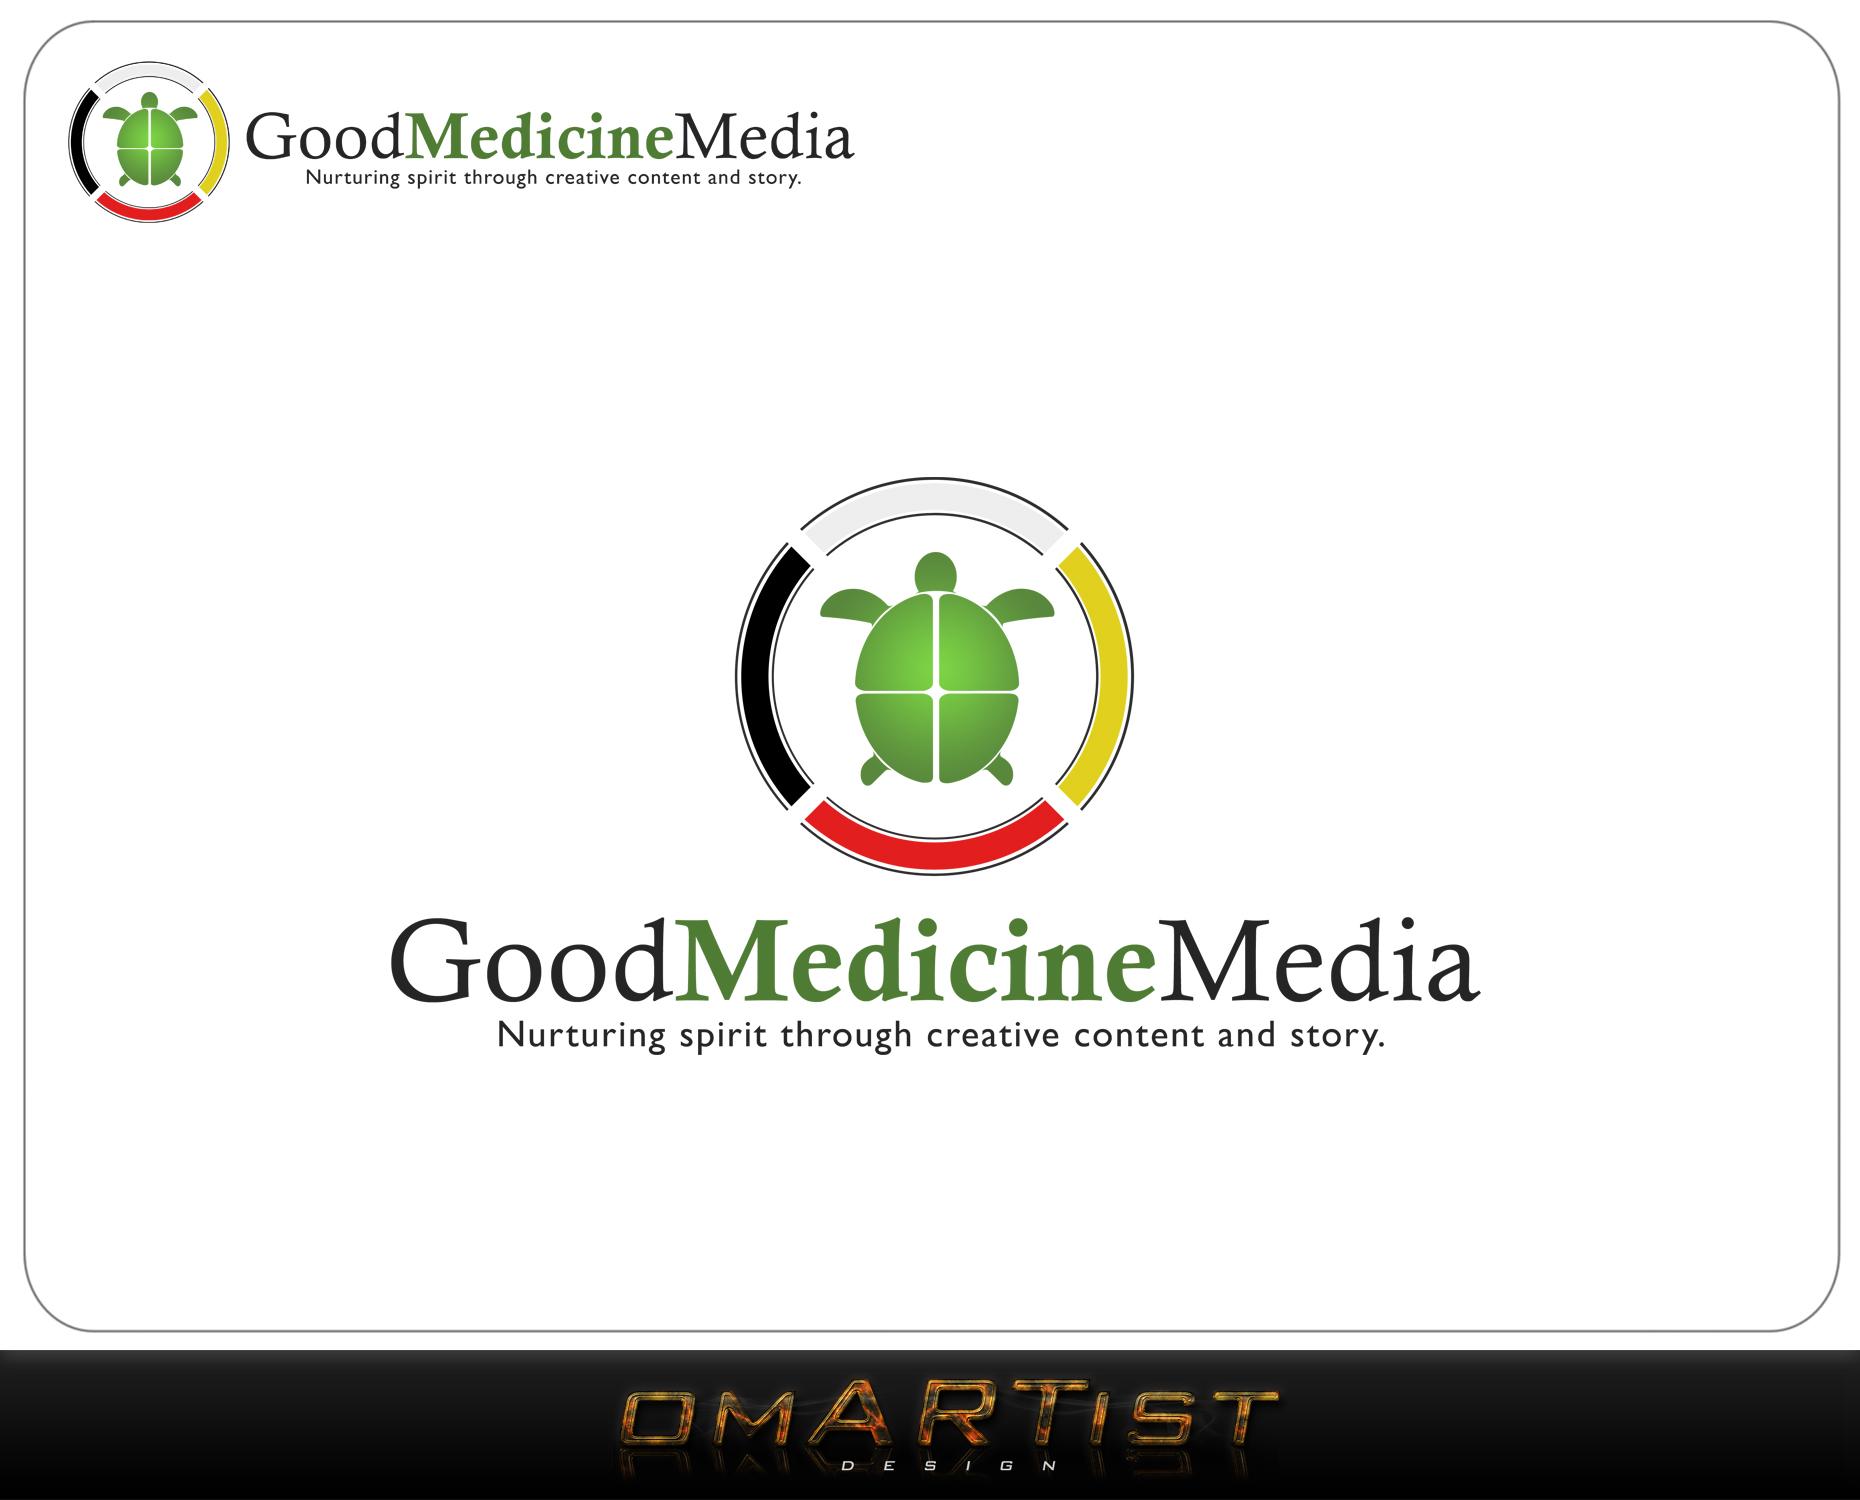 Logo Design by omARTist - Entry No. 141 in the Logo Design Contest Good Medicine Media Logo Design.